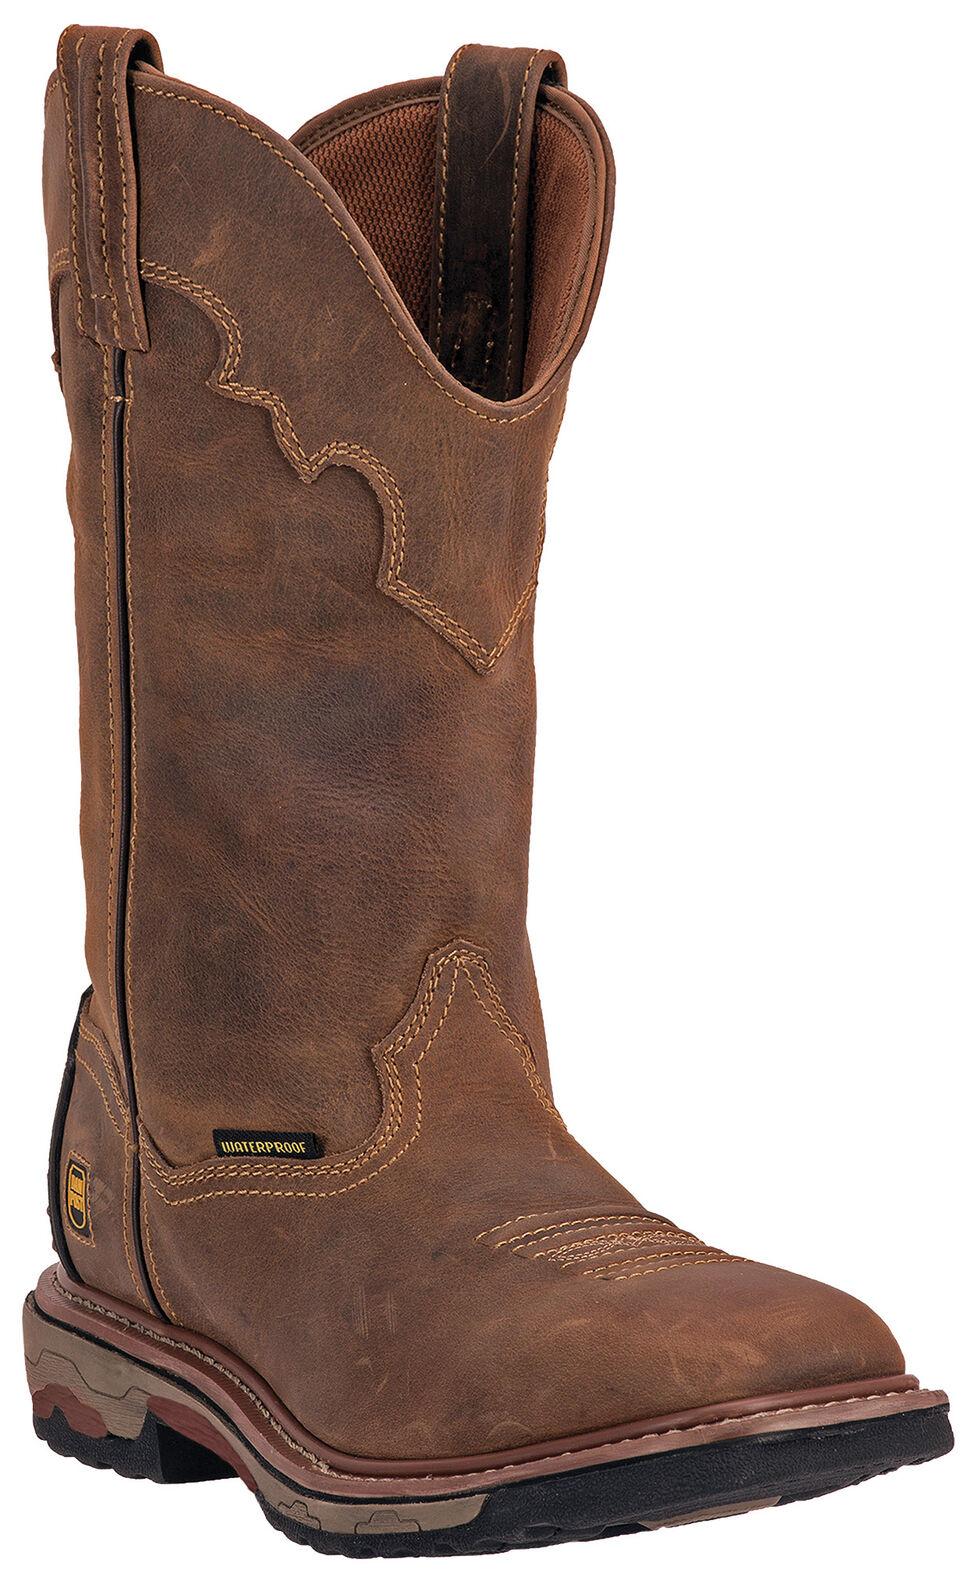 Dan Post Blayde Waterproof Wellington Work Boots - Steel Toe, Saddle Tan, hi-res